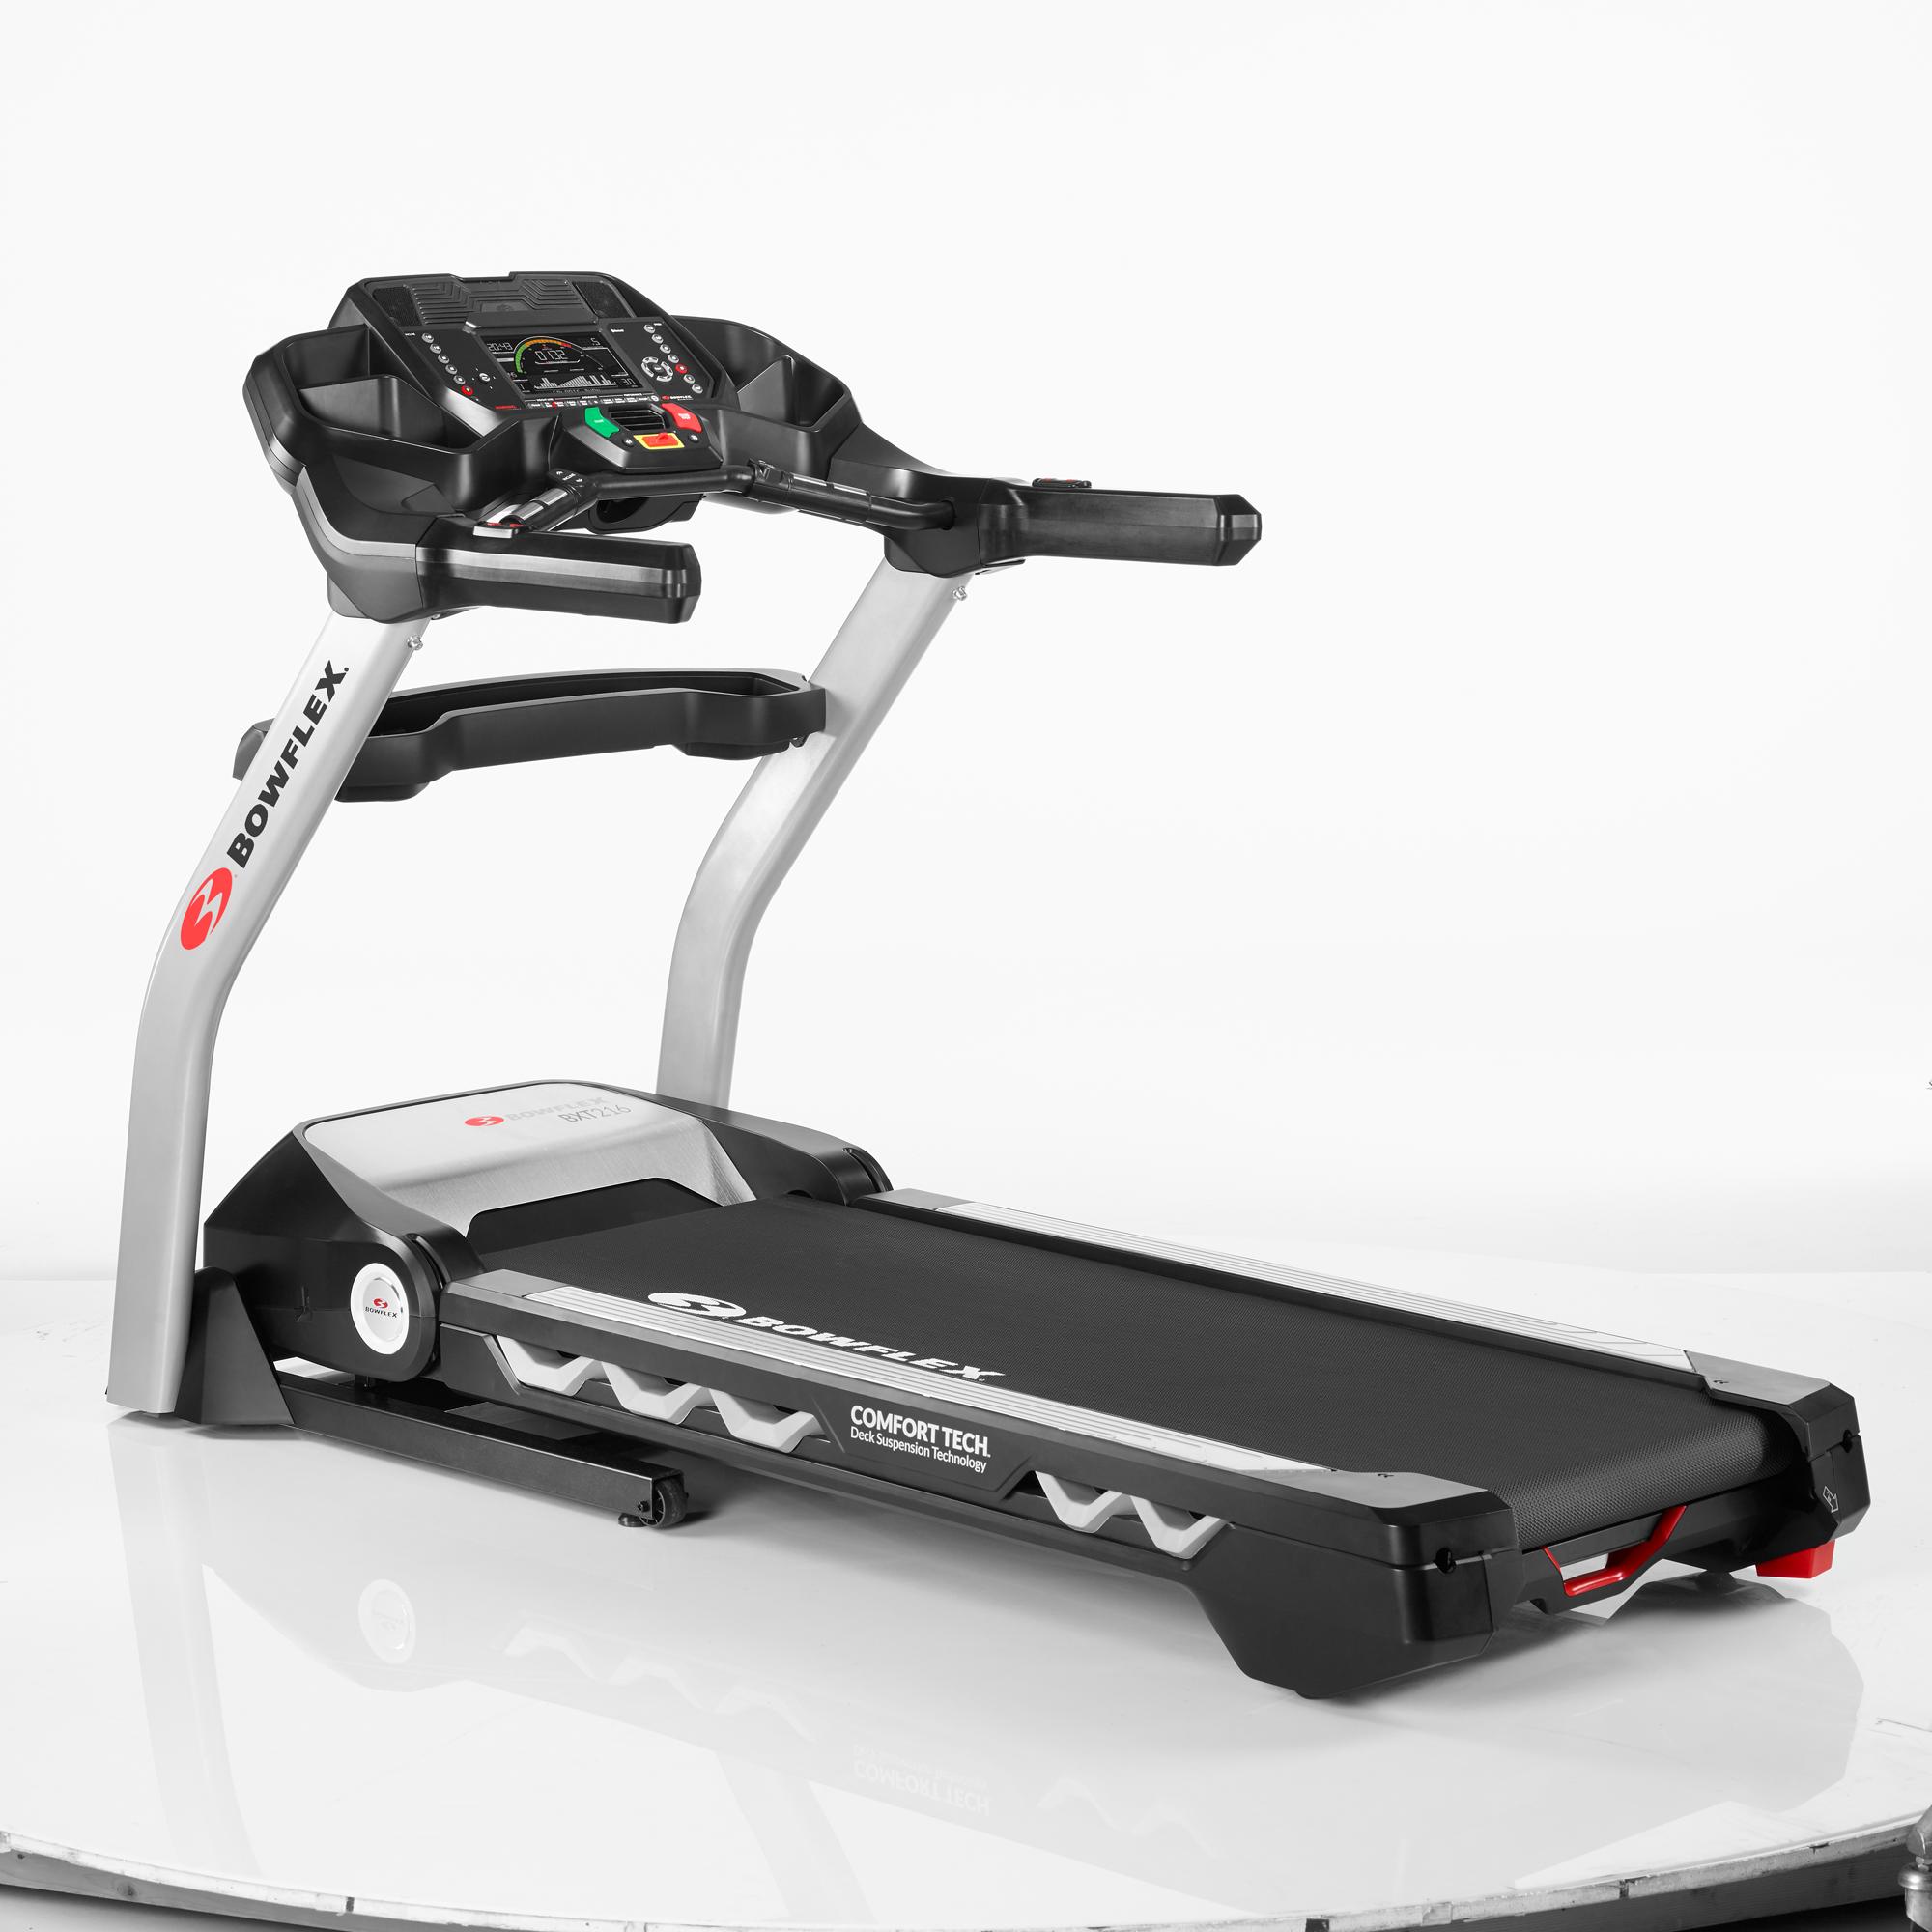 Nautilus Treadclimber Gebraucht: Bowflex BXT216 Treadmill